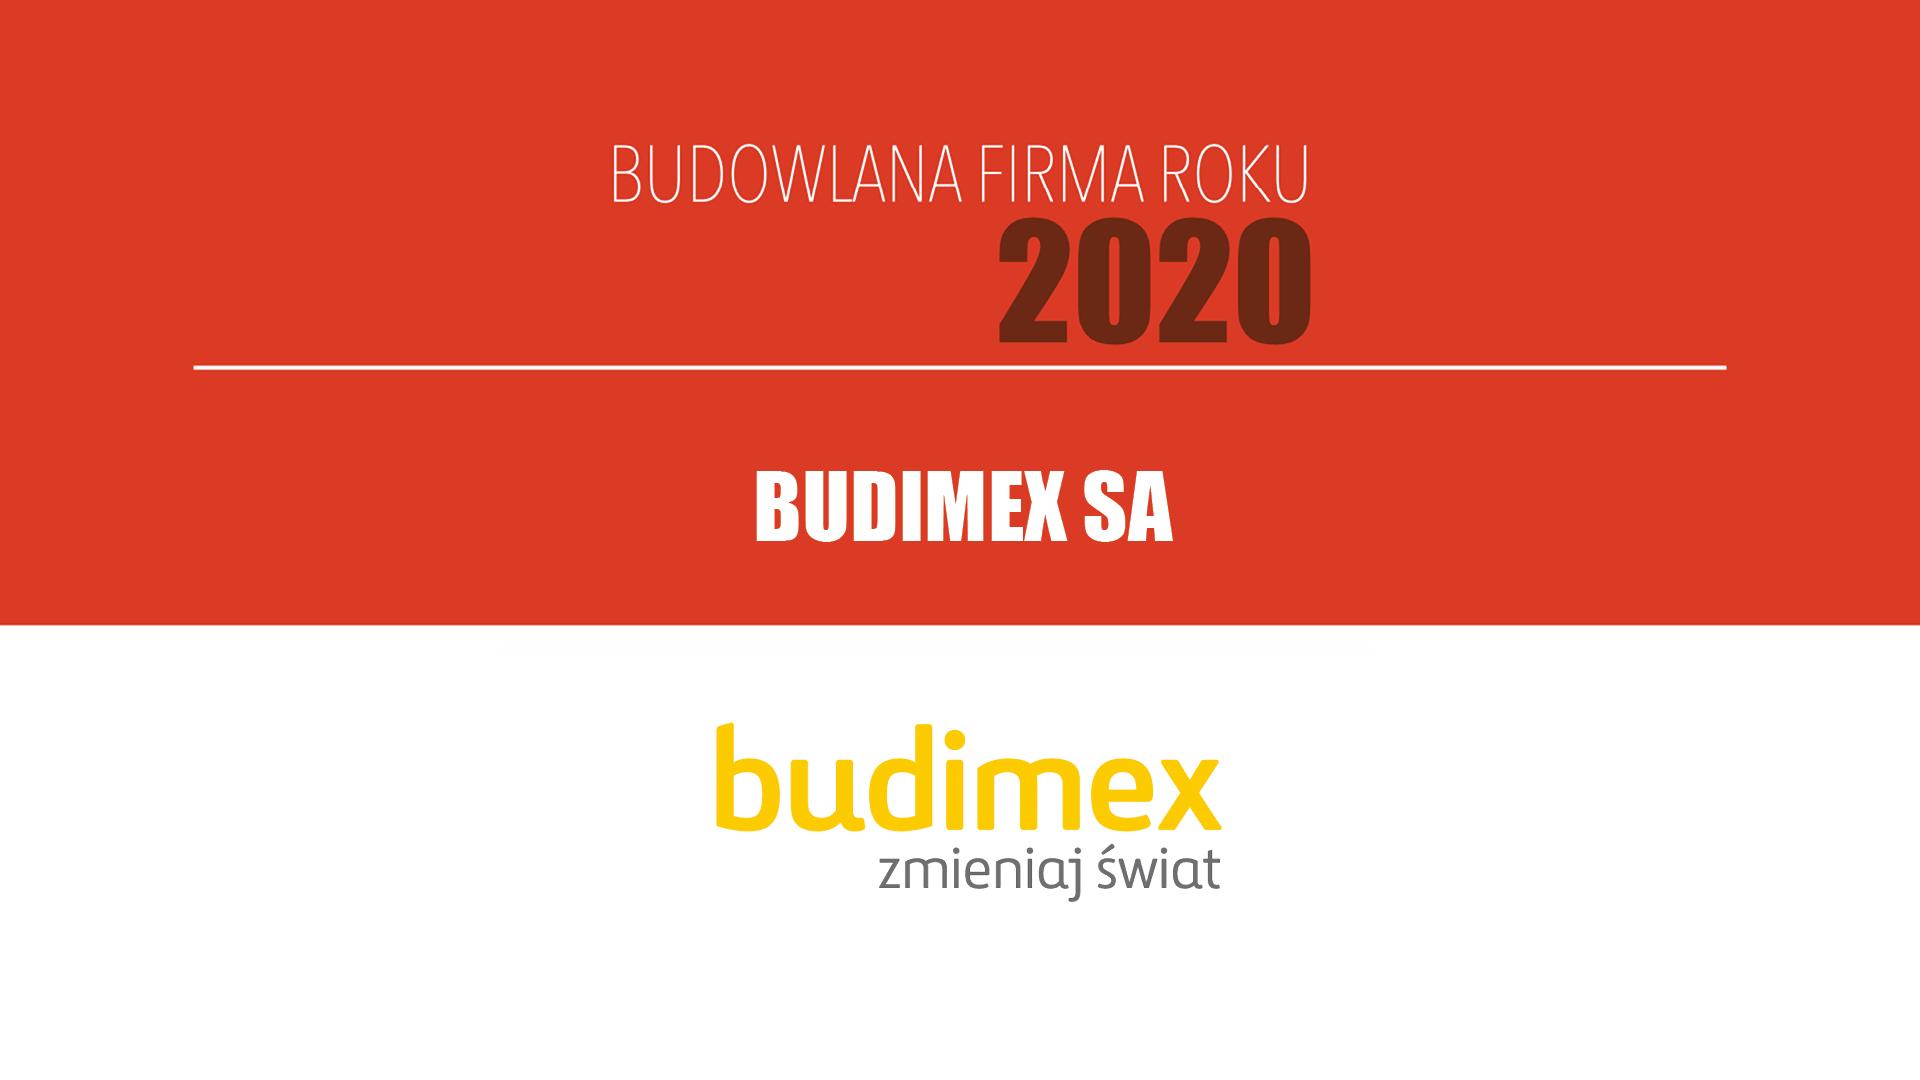 BUDIMEX SA – Budowlana Firma Roku 2020